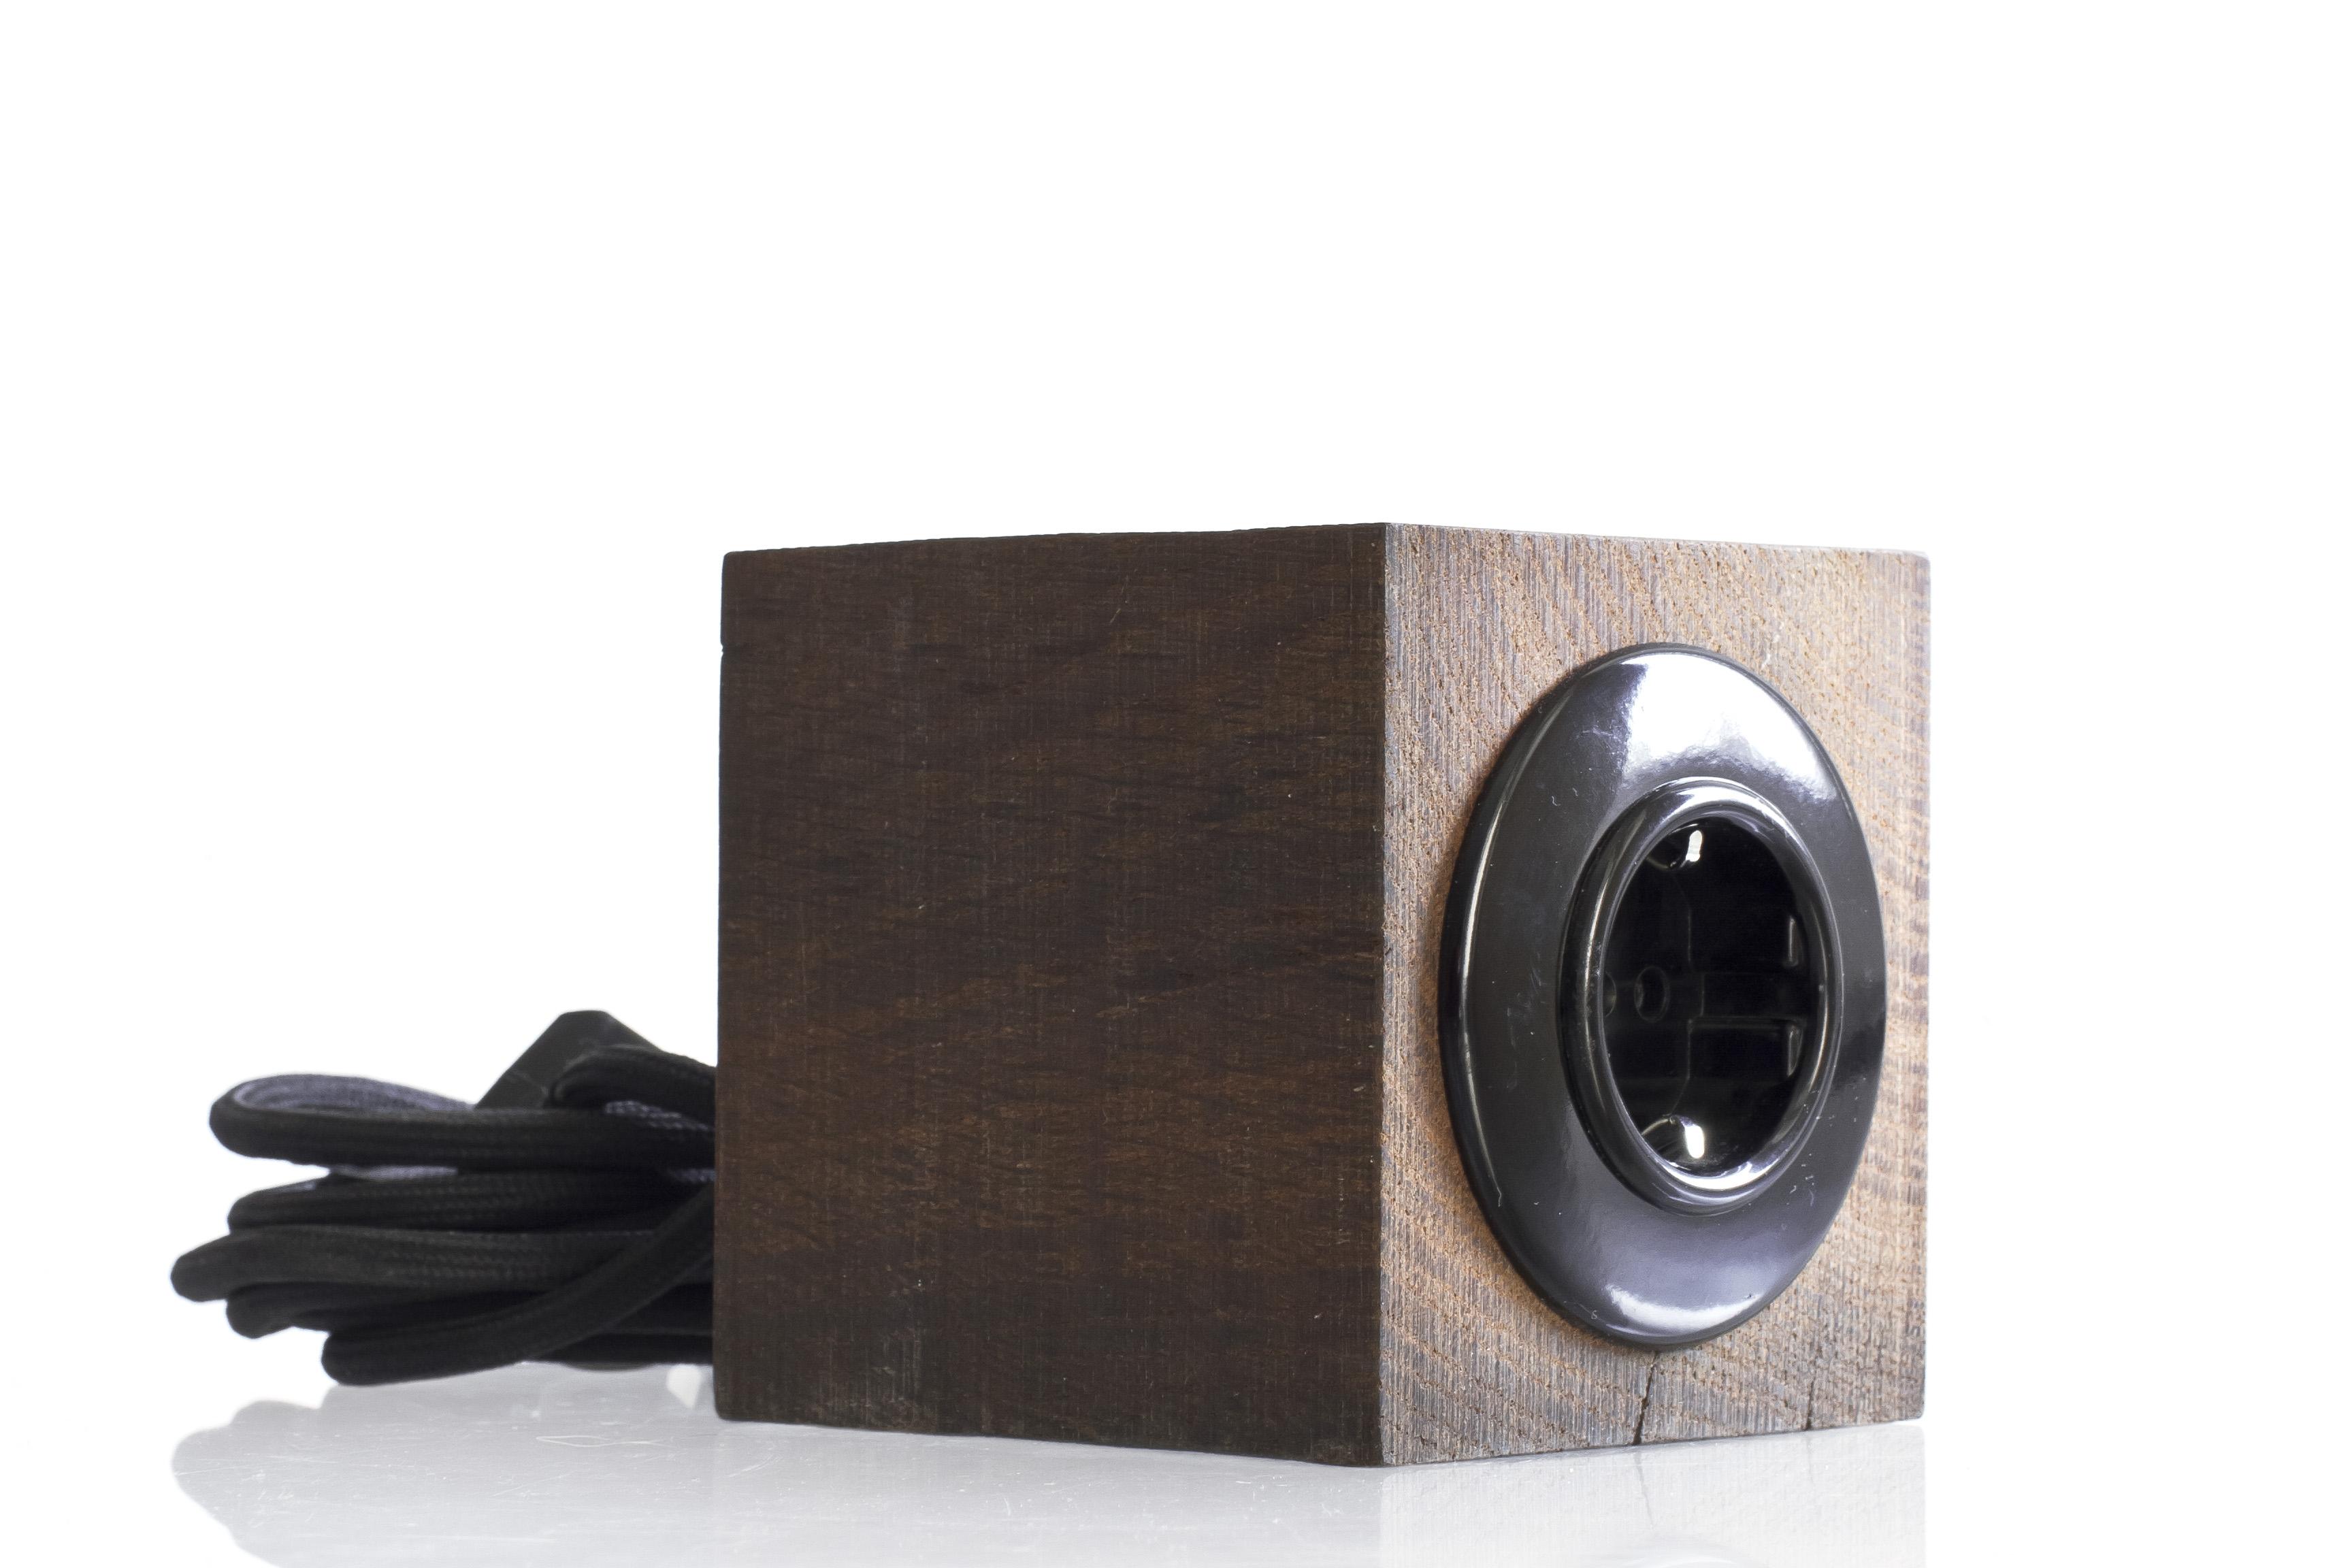 onktokatuh f r eine schoenere welt. Black Bedroom Furniture Sets. Home Design Ideas